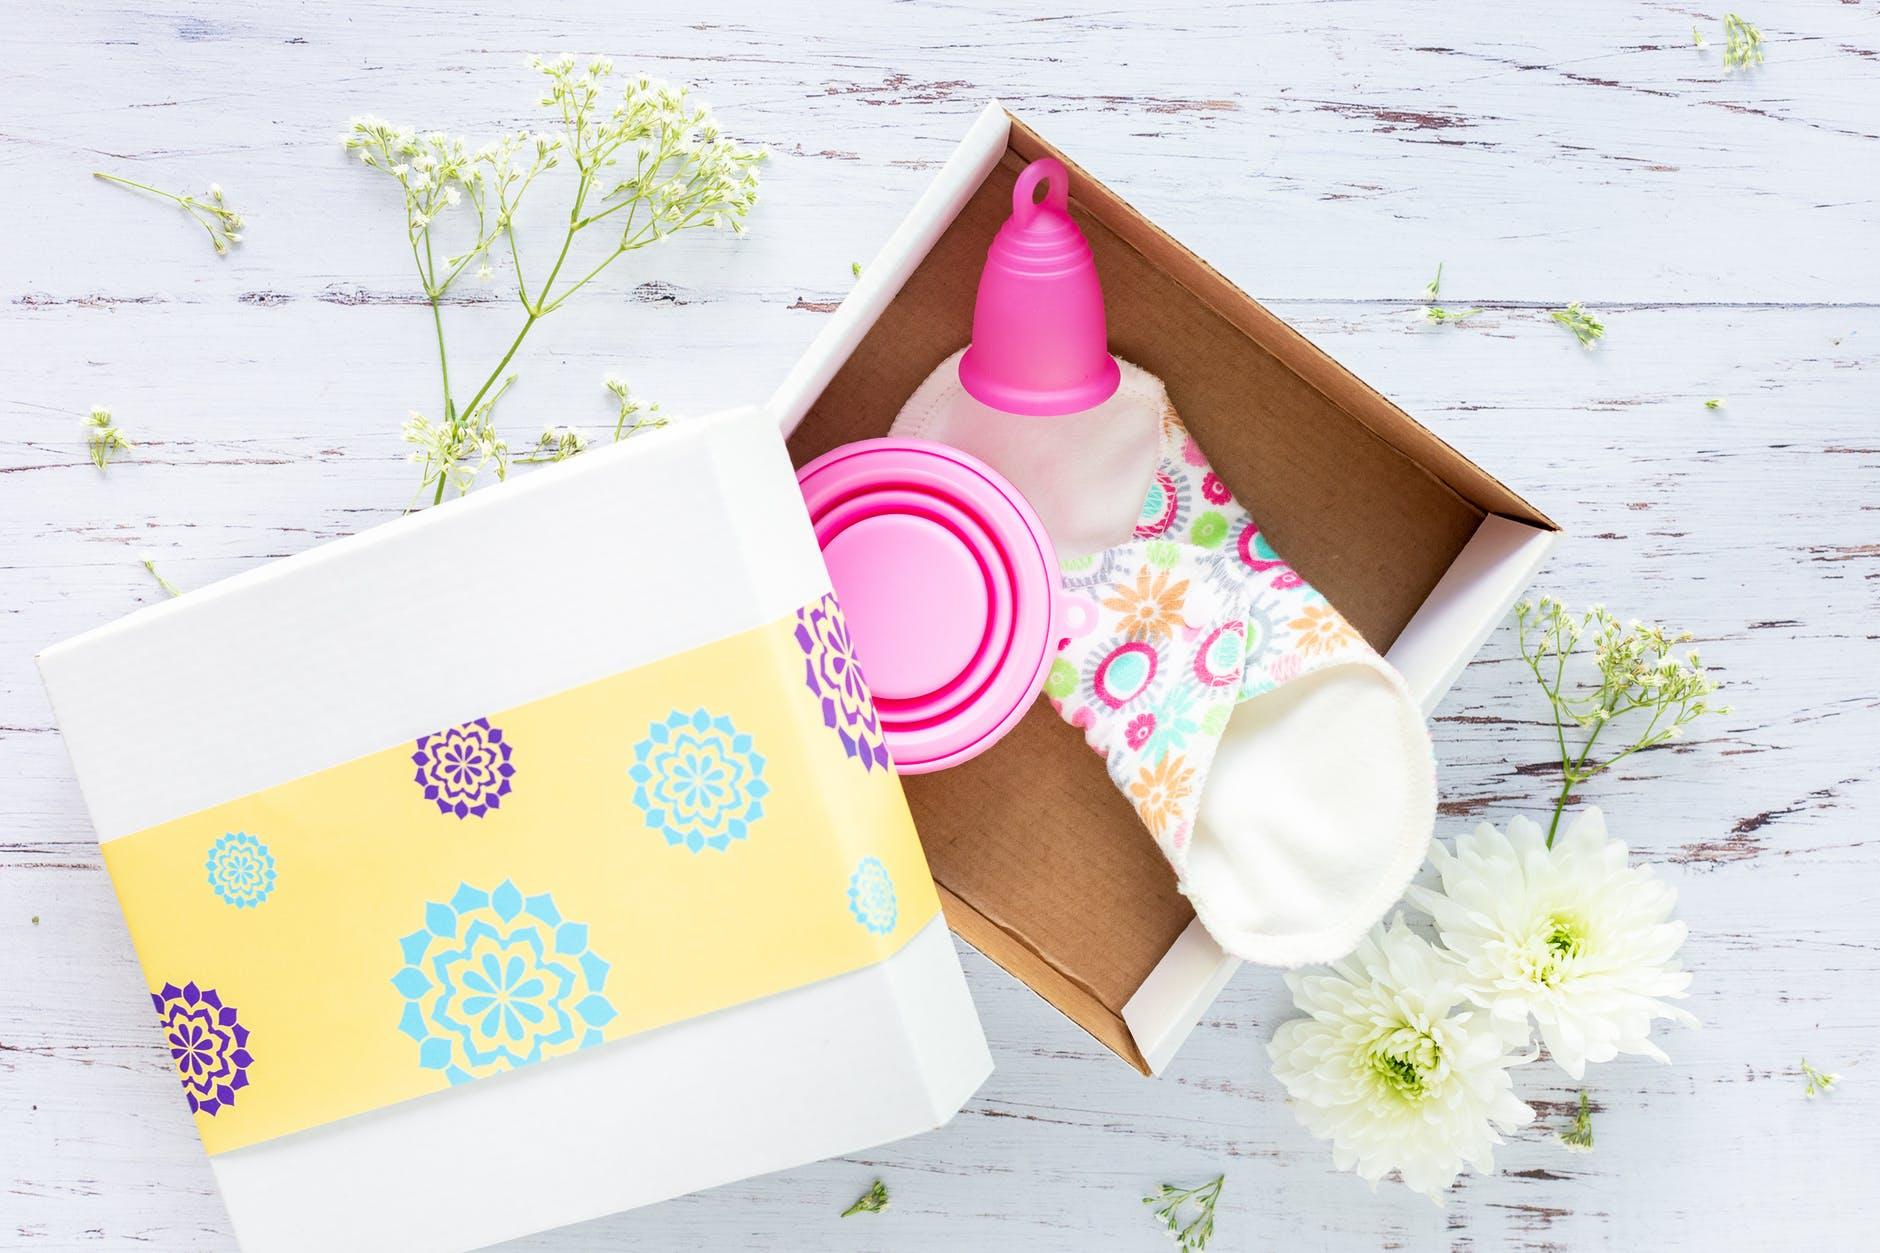 produits d'hygiène féminine durables